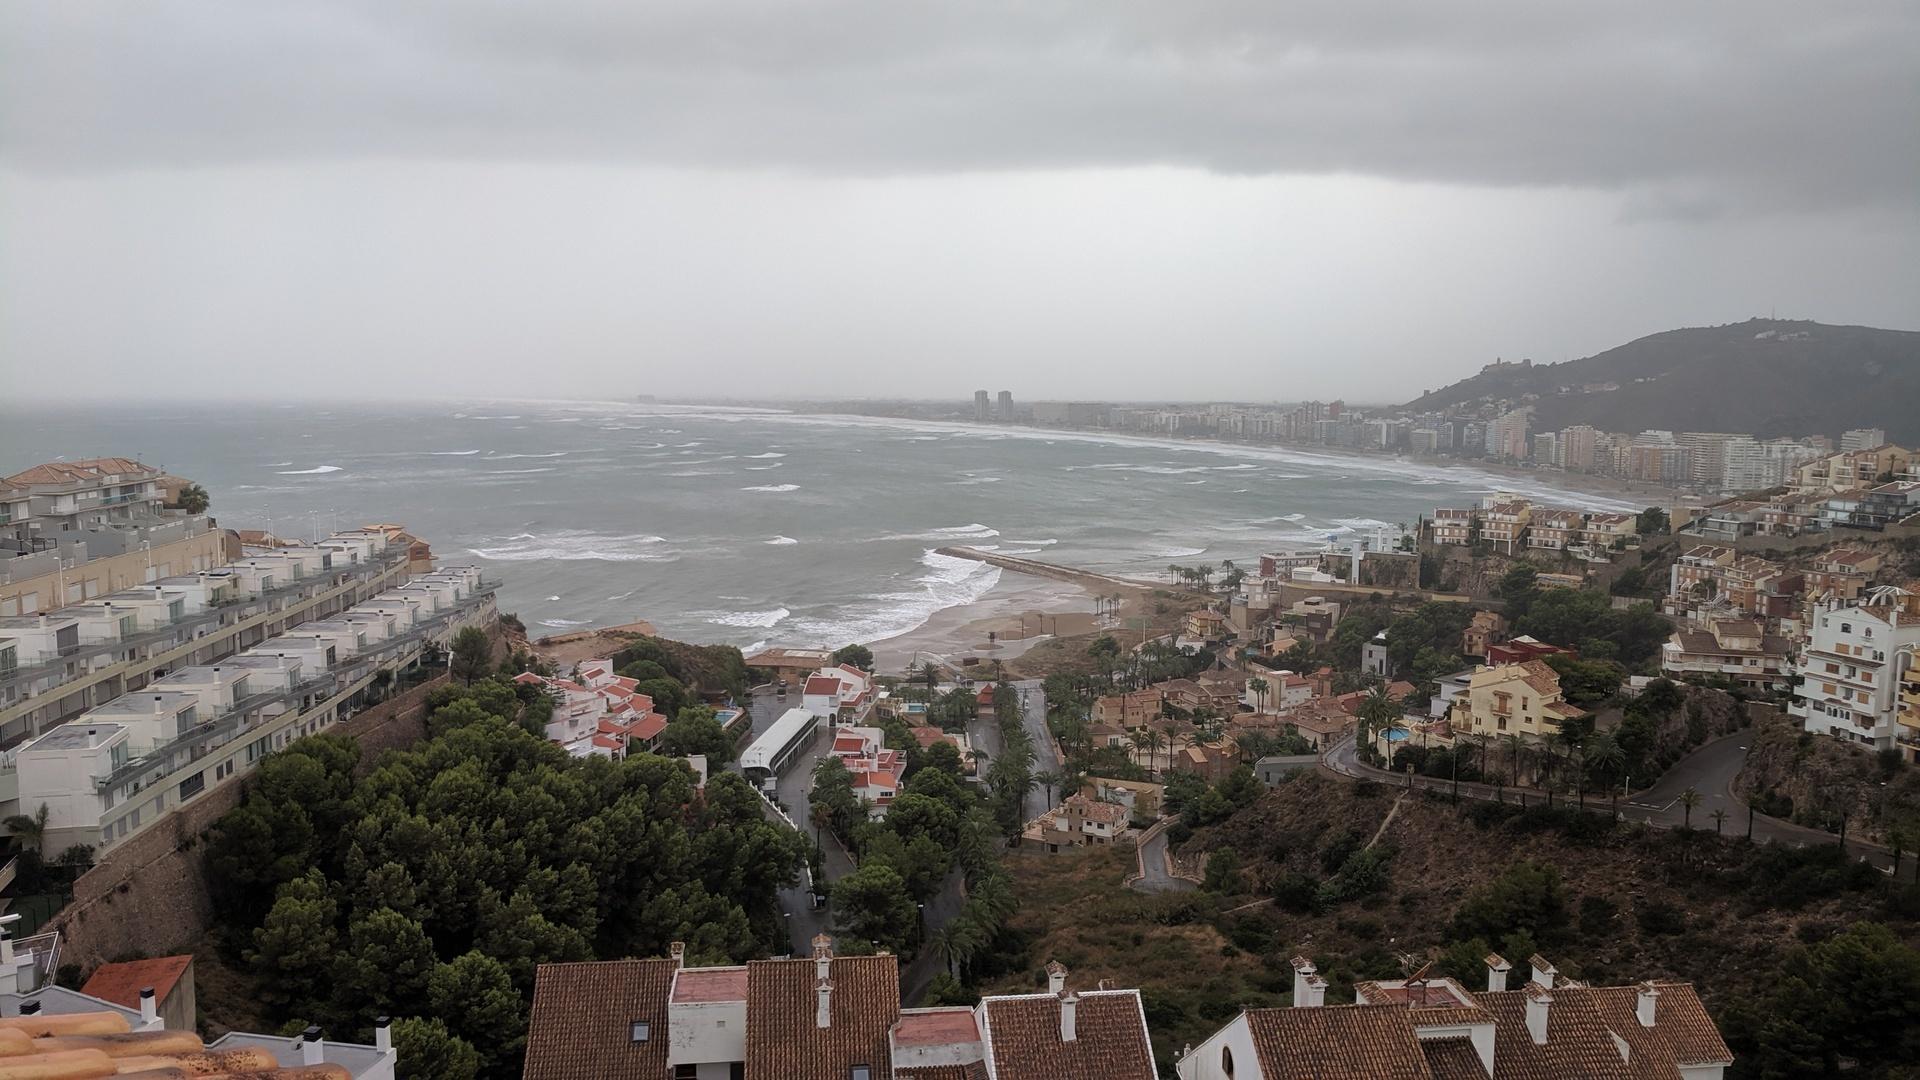 Playa Cap Blanc Cullera en un día de tormenta